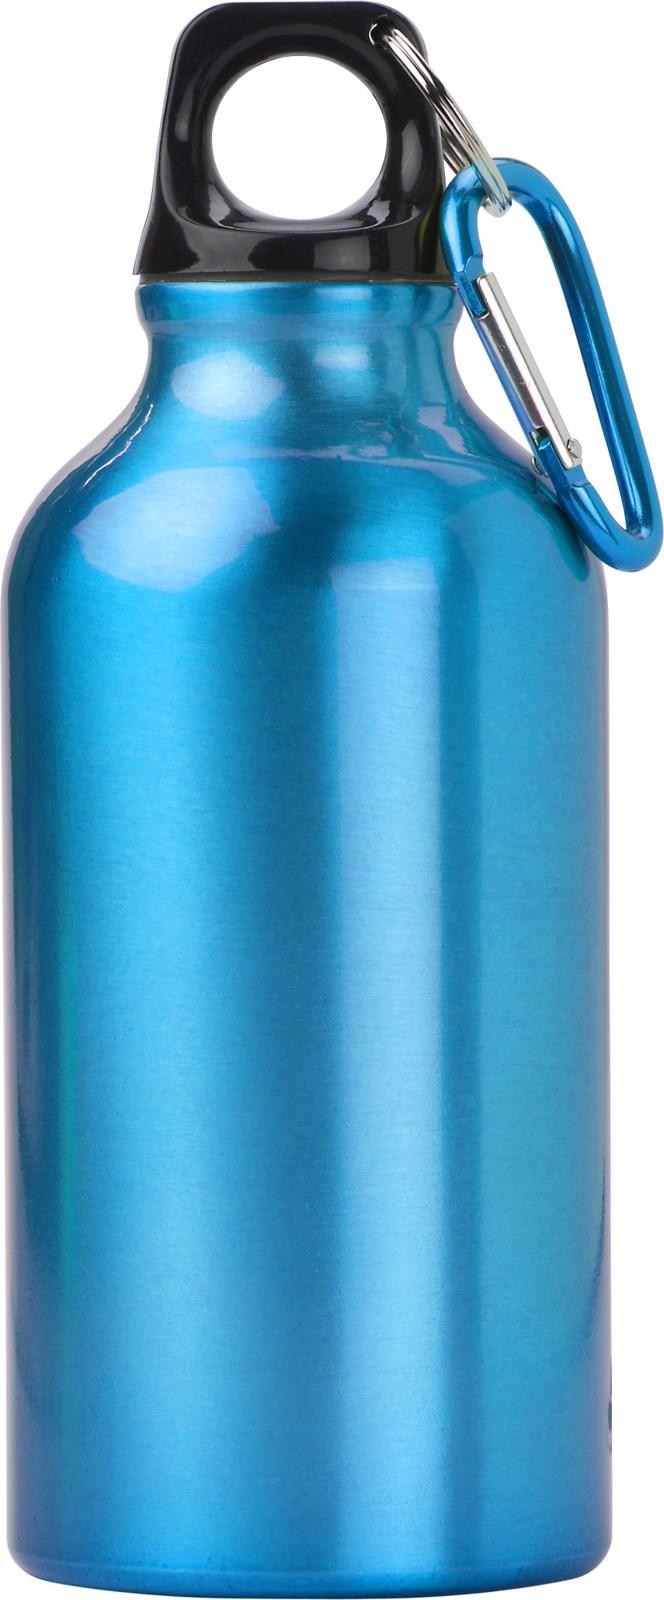 Aluminium bottle - Light Blue